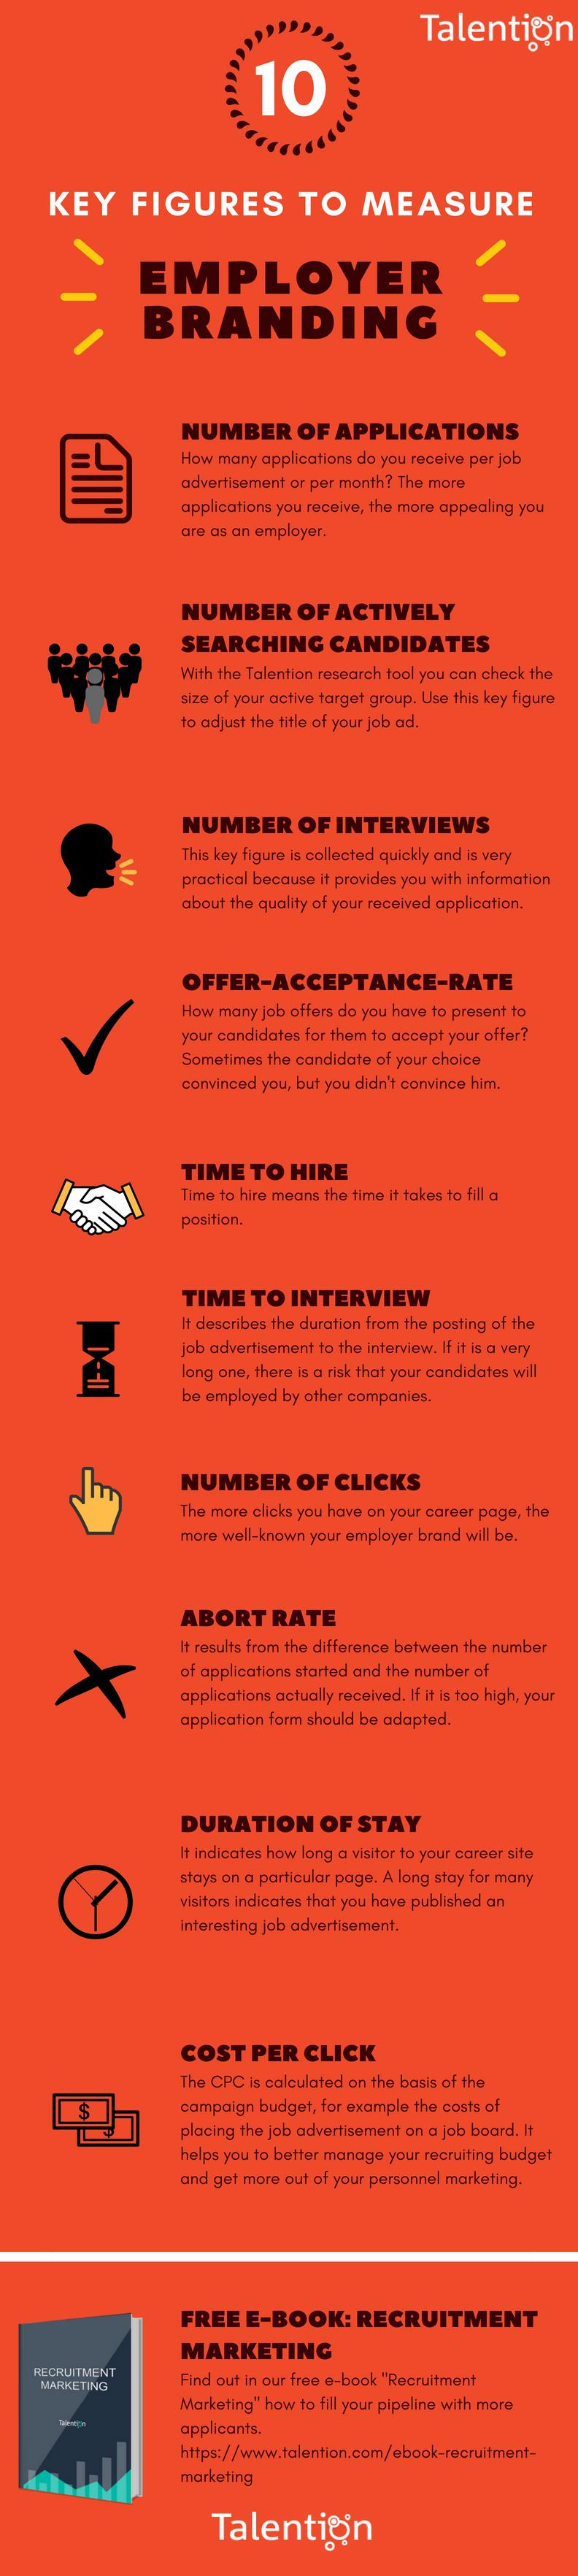 10 Key Figures to Measure Employer Branding